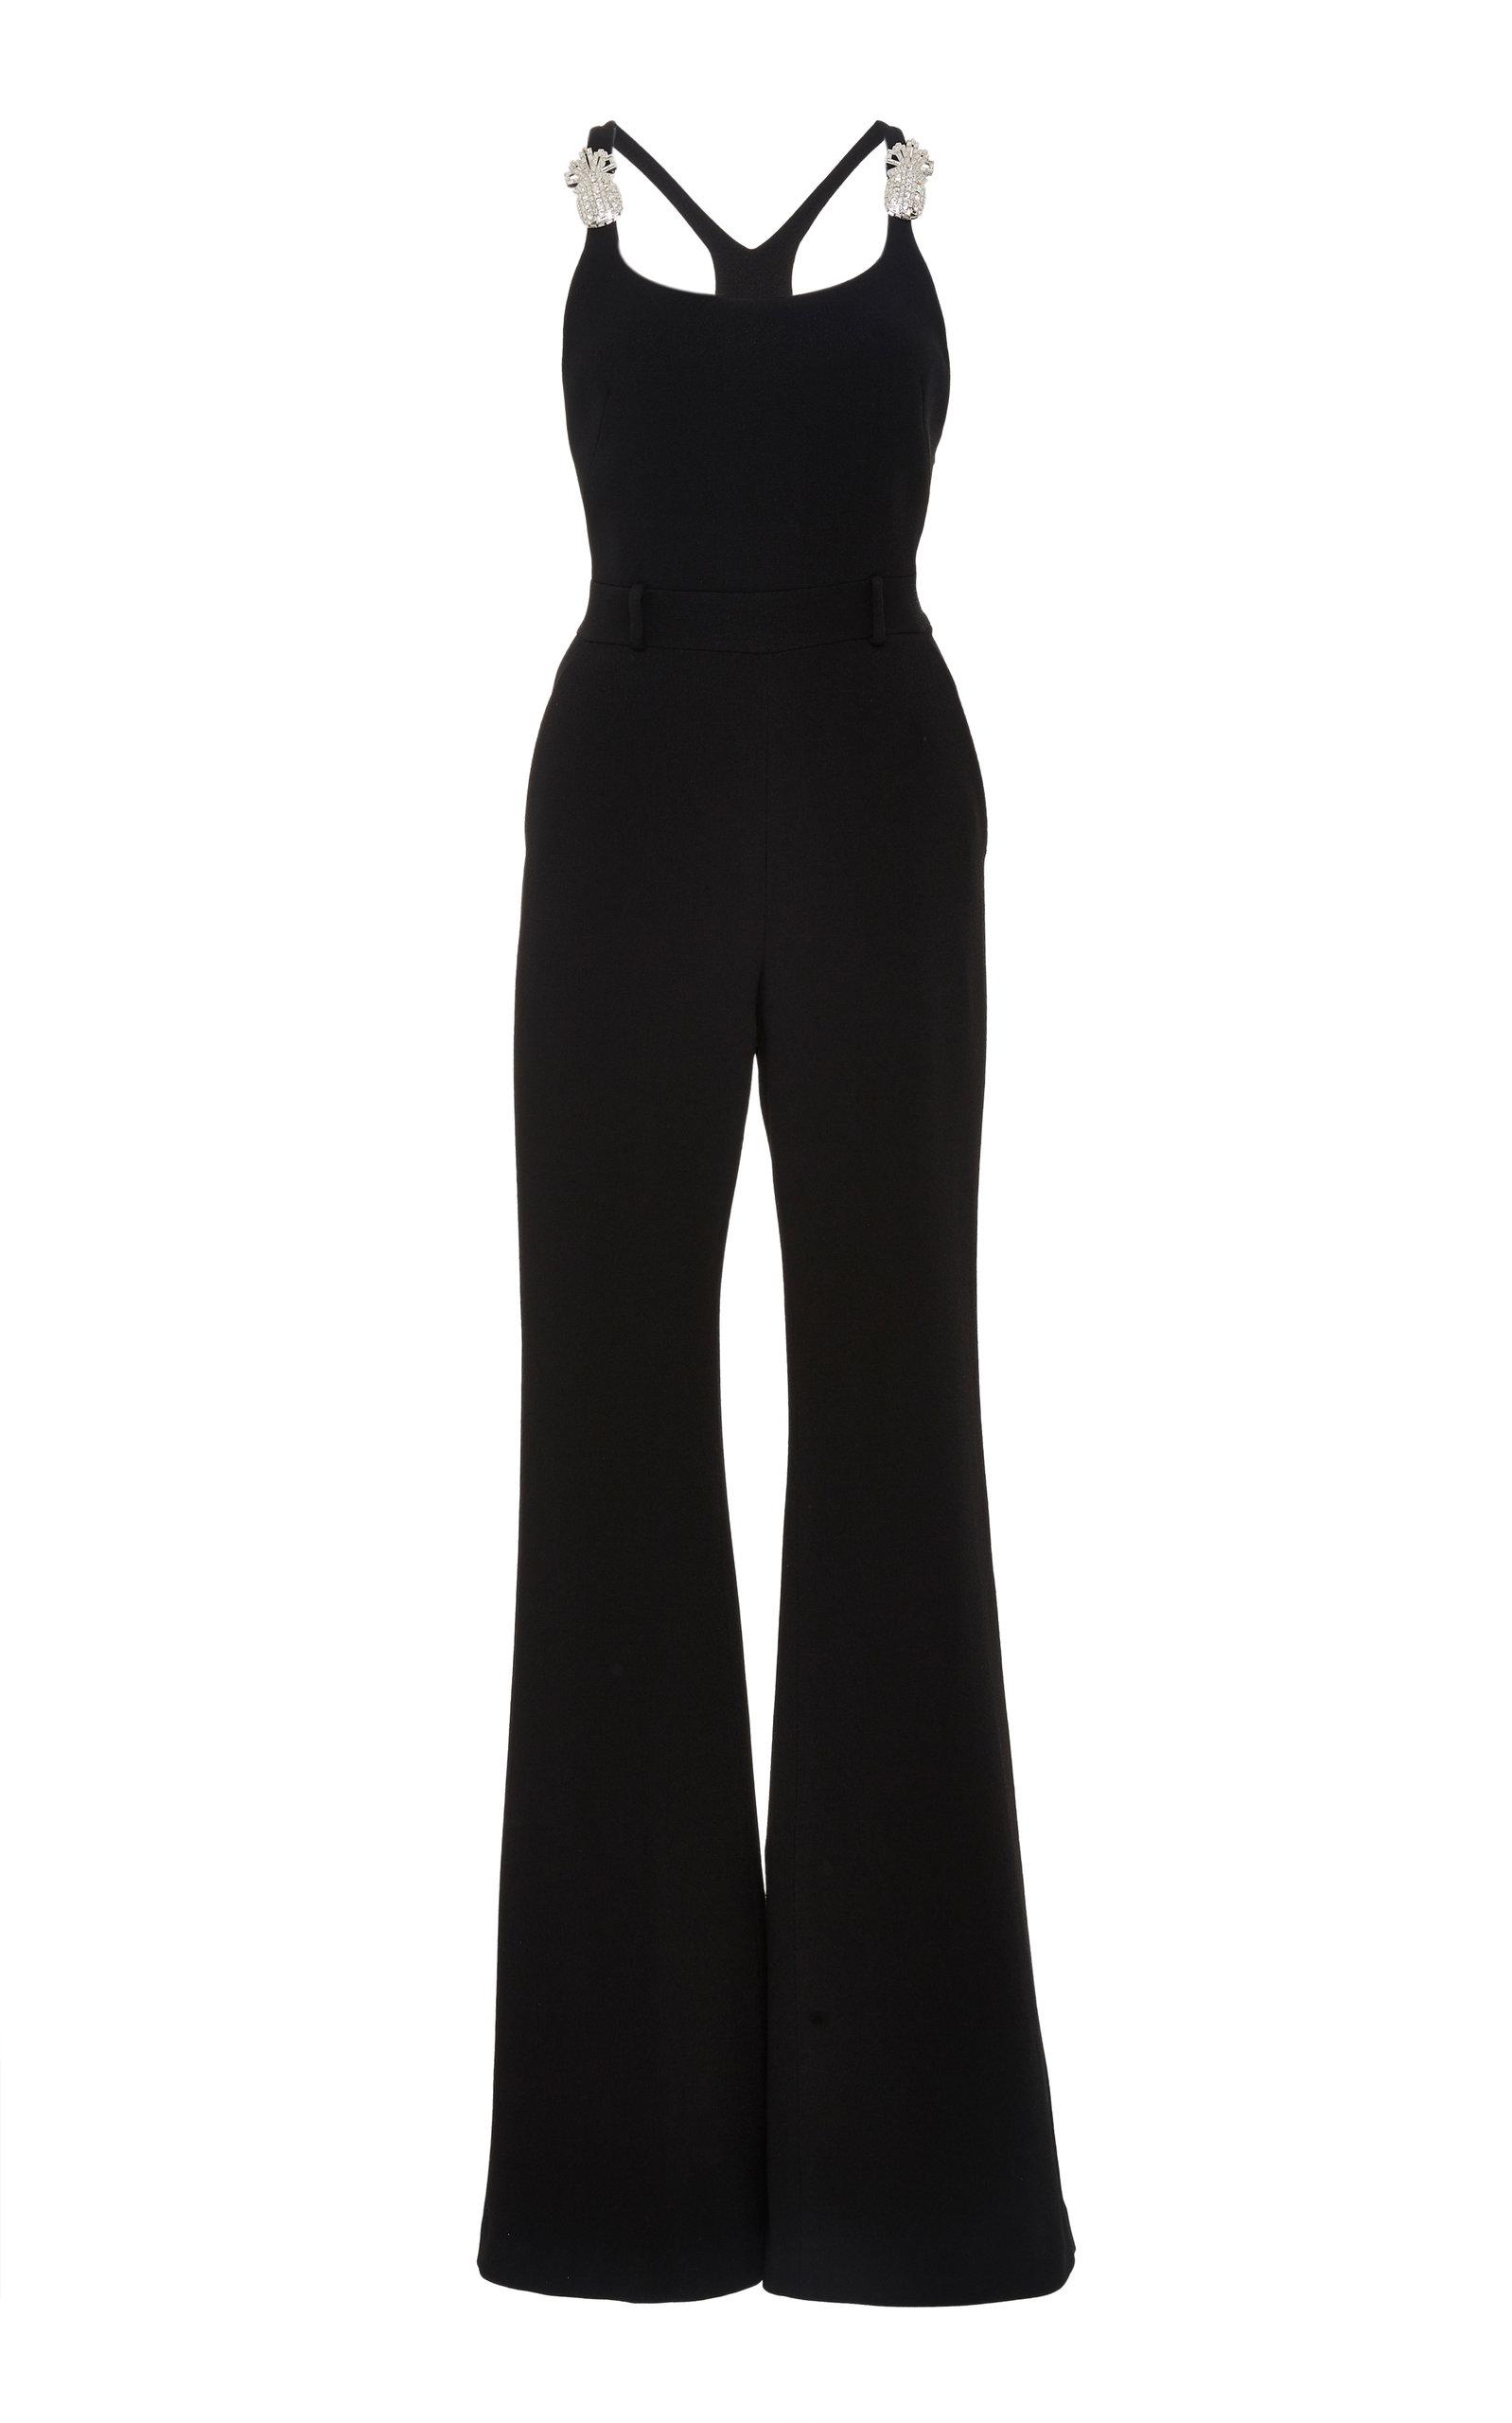 Scoop-Neck Thin-Strap Flared-Leg Jumpsuit W/ Pineapple Crystal-Embellished, Black